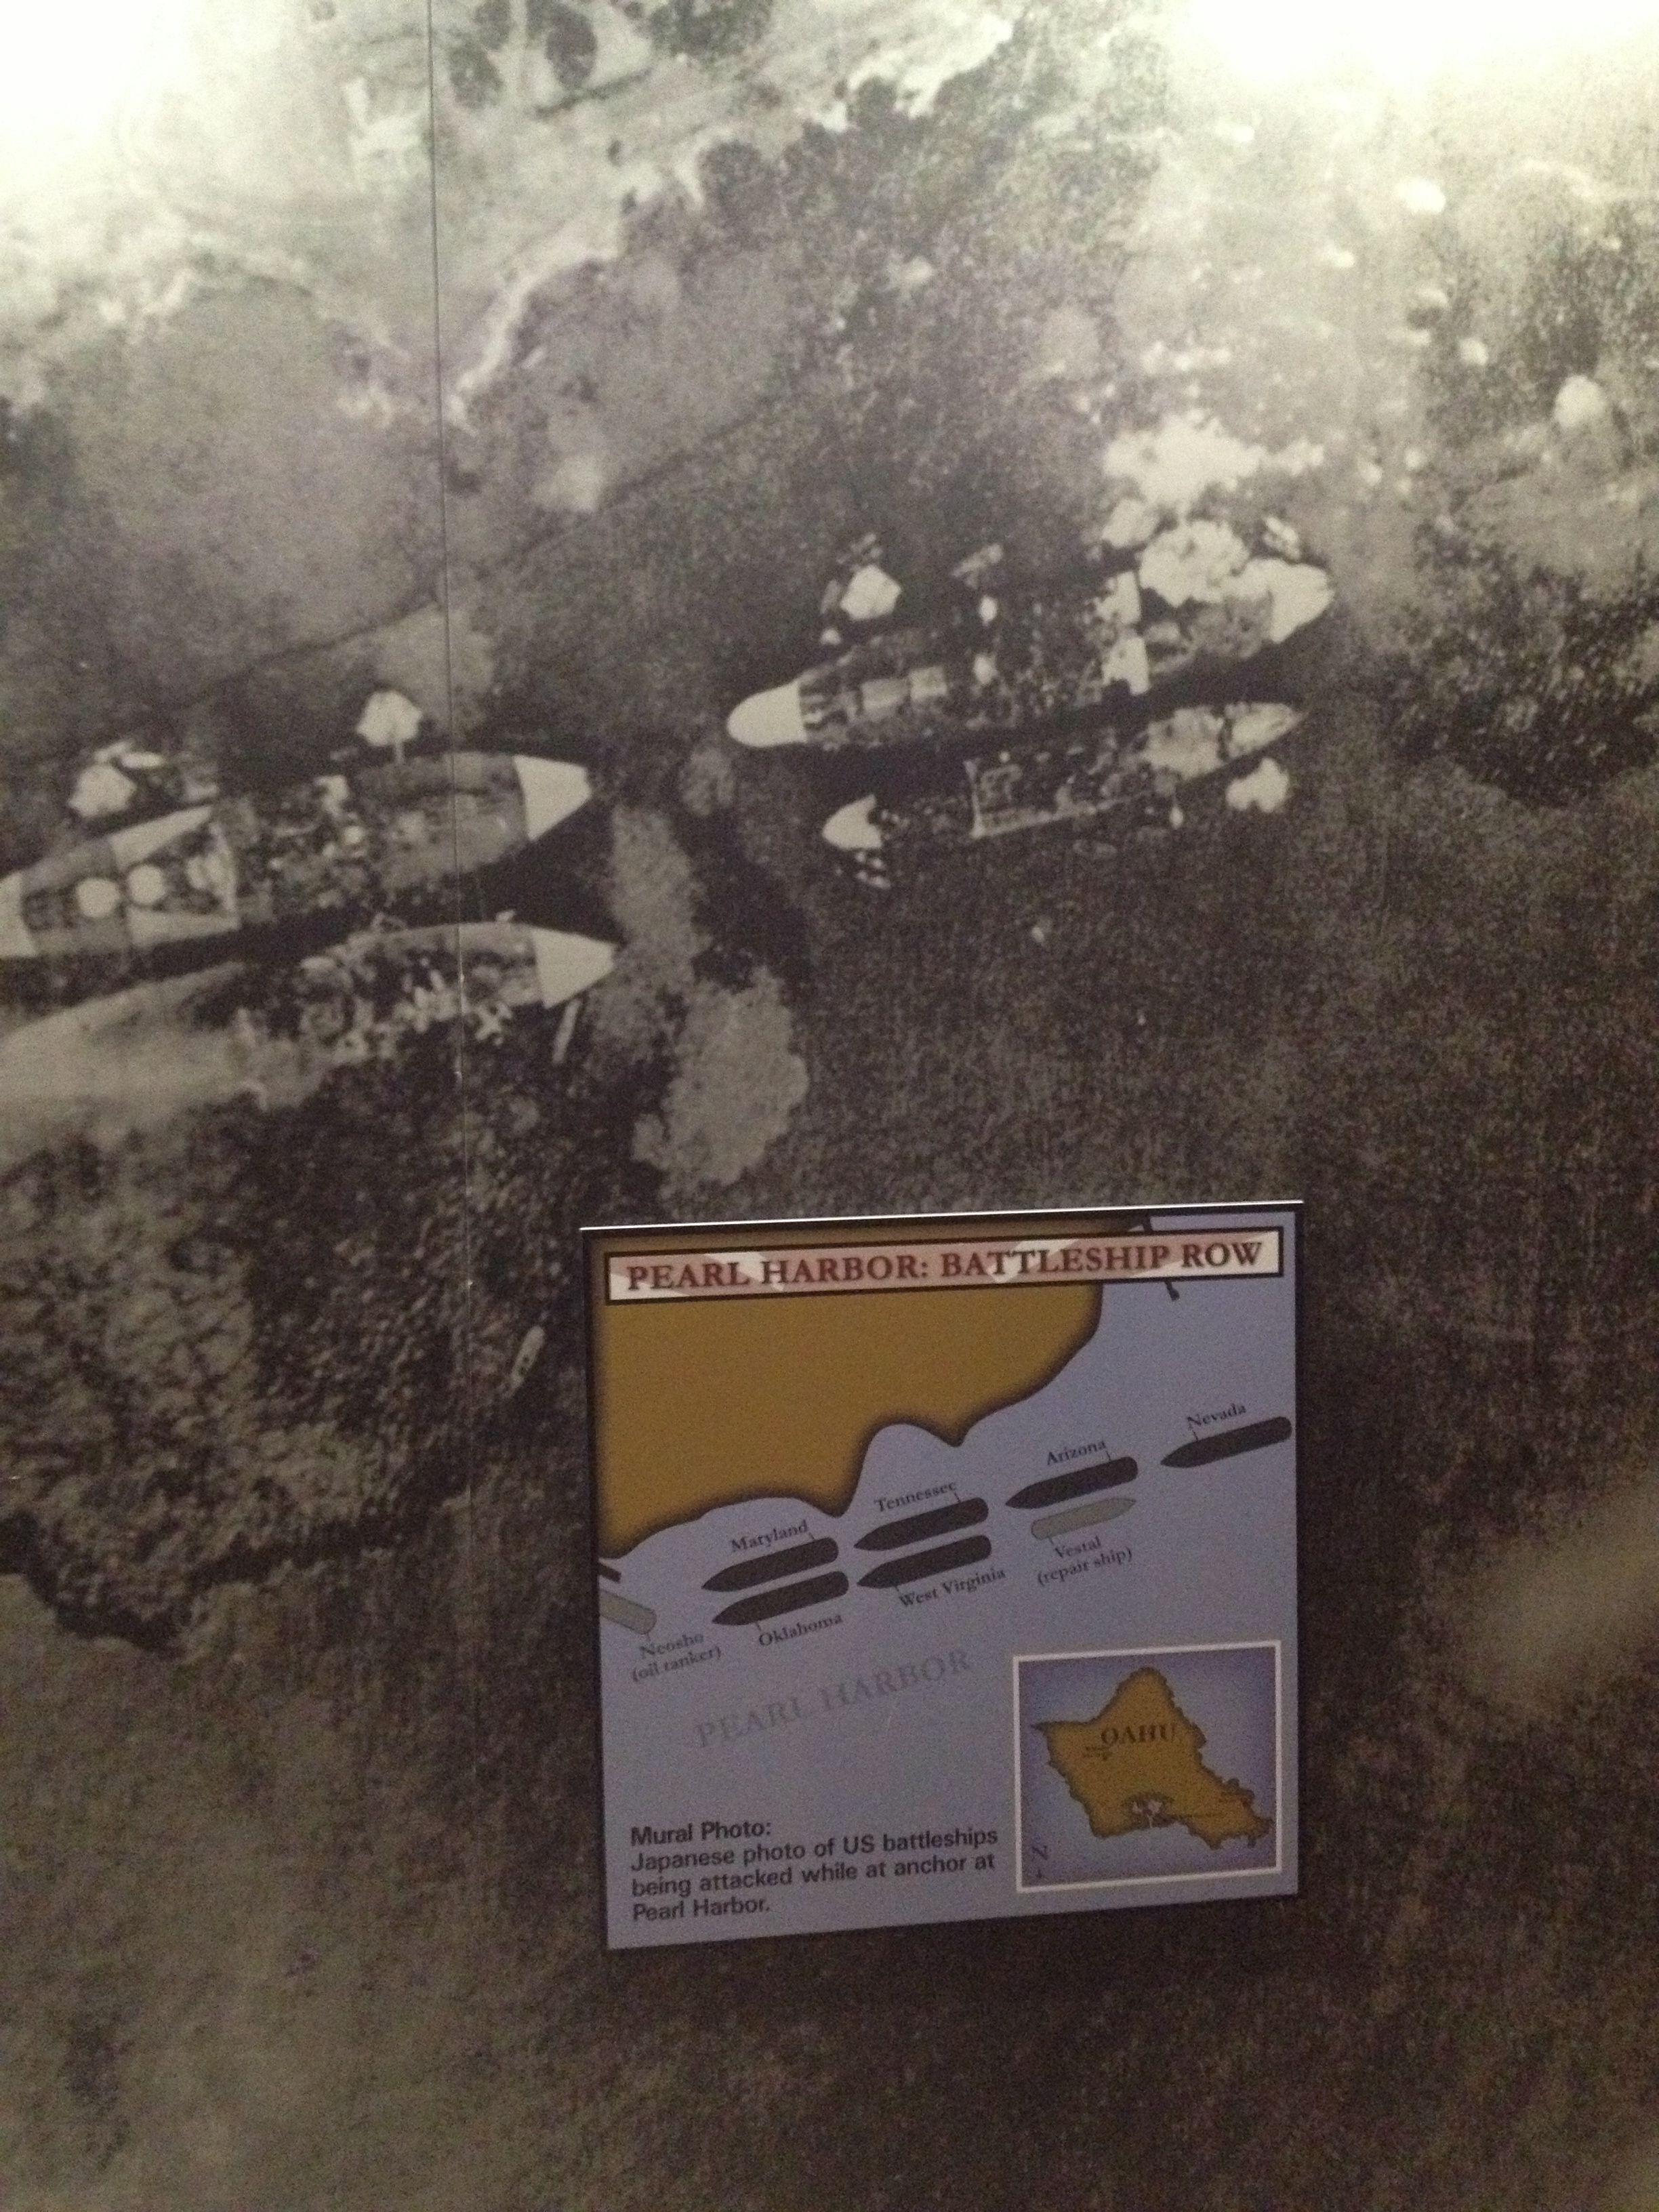 Map of Battleship Row Pearl Harbor Pearl harbor